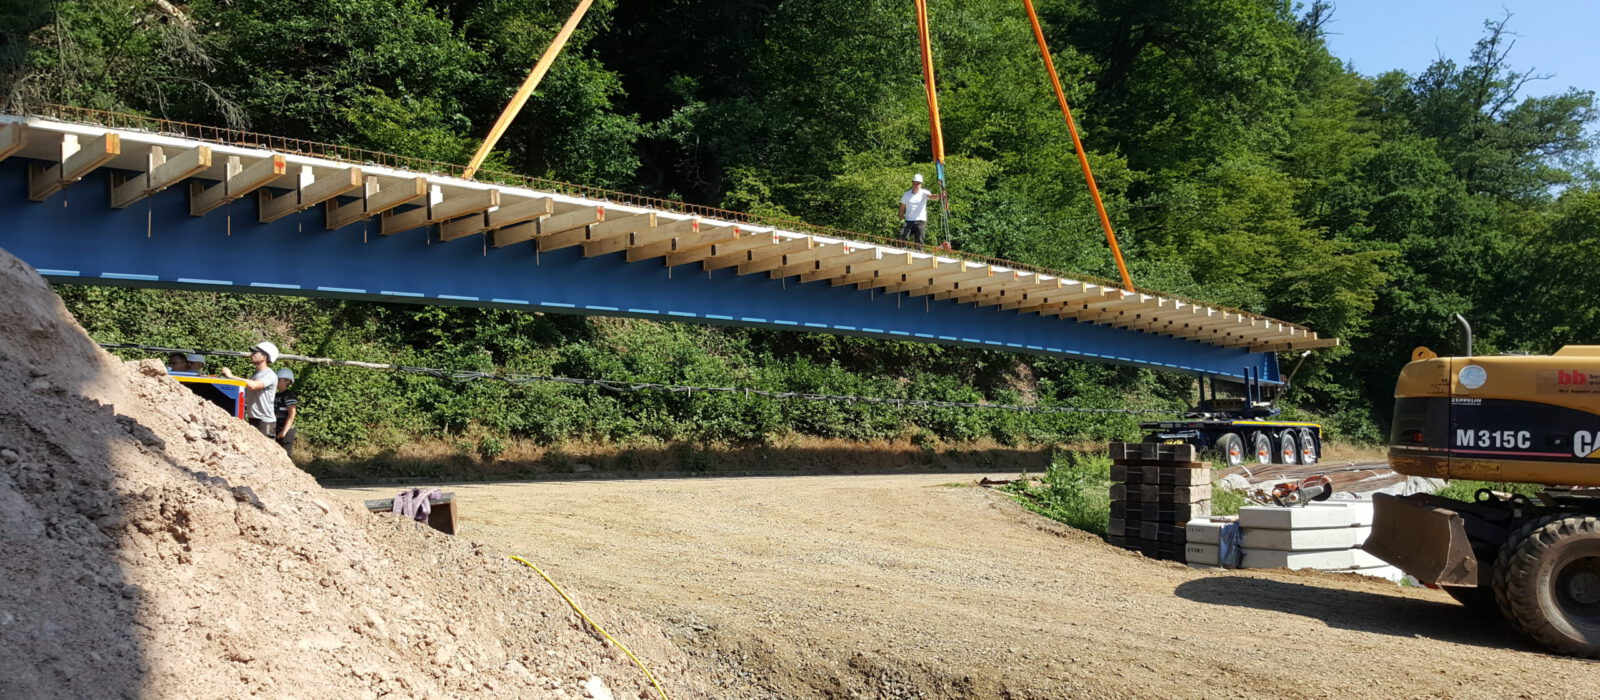 Brückenbau beck-bau in Büchenwerra